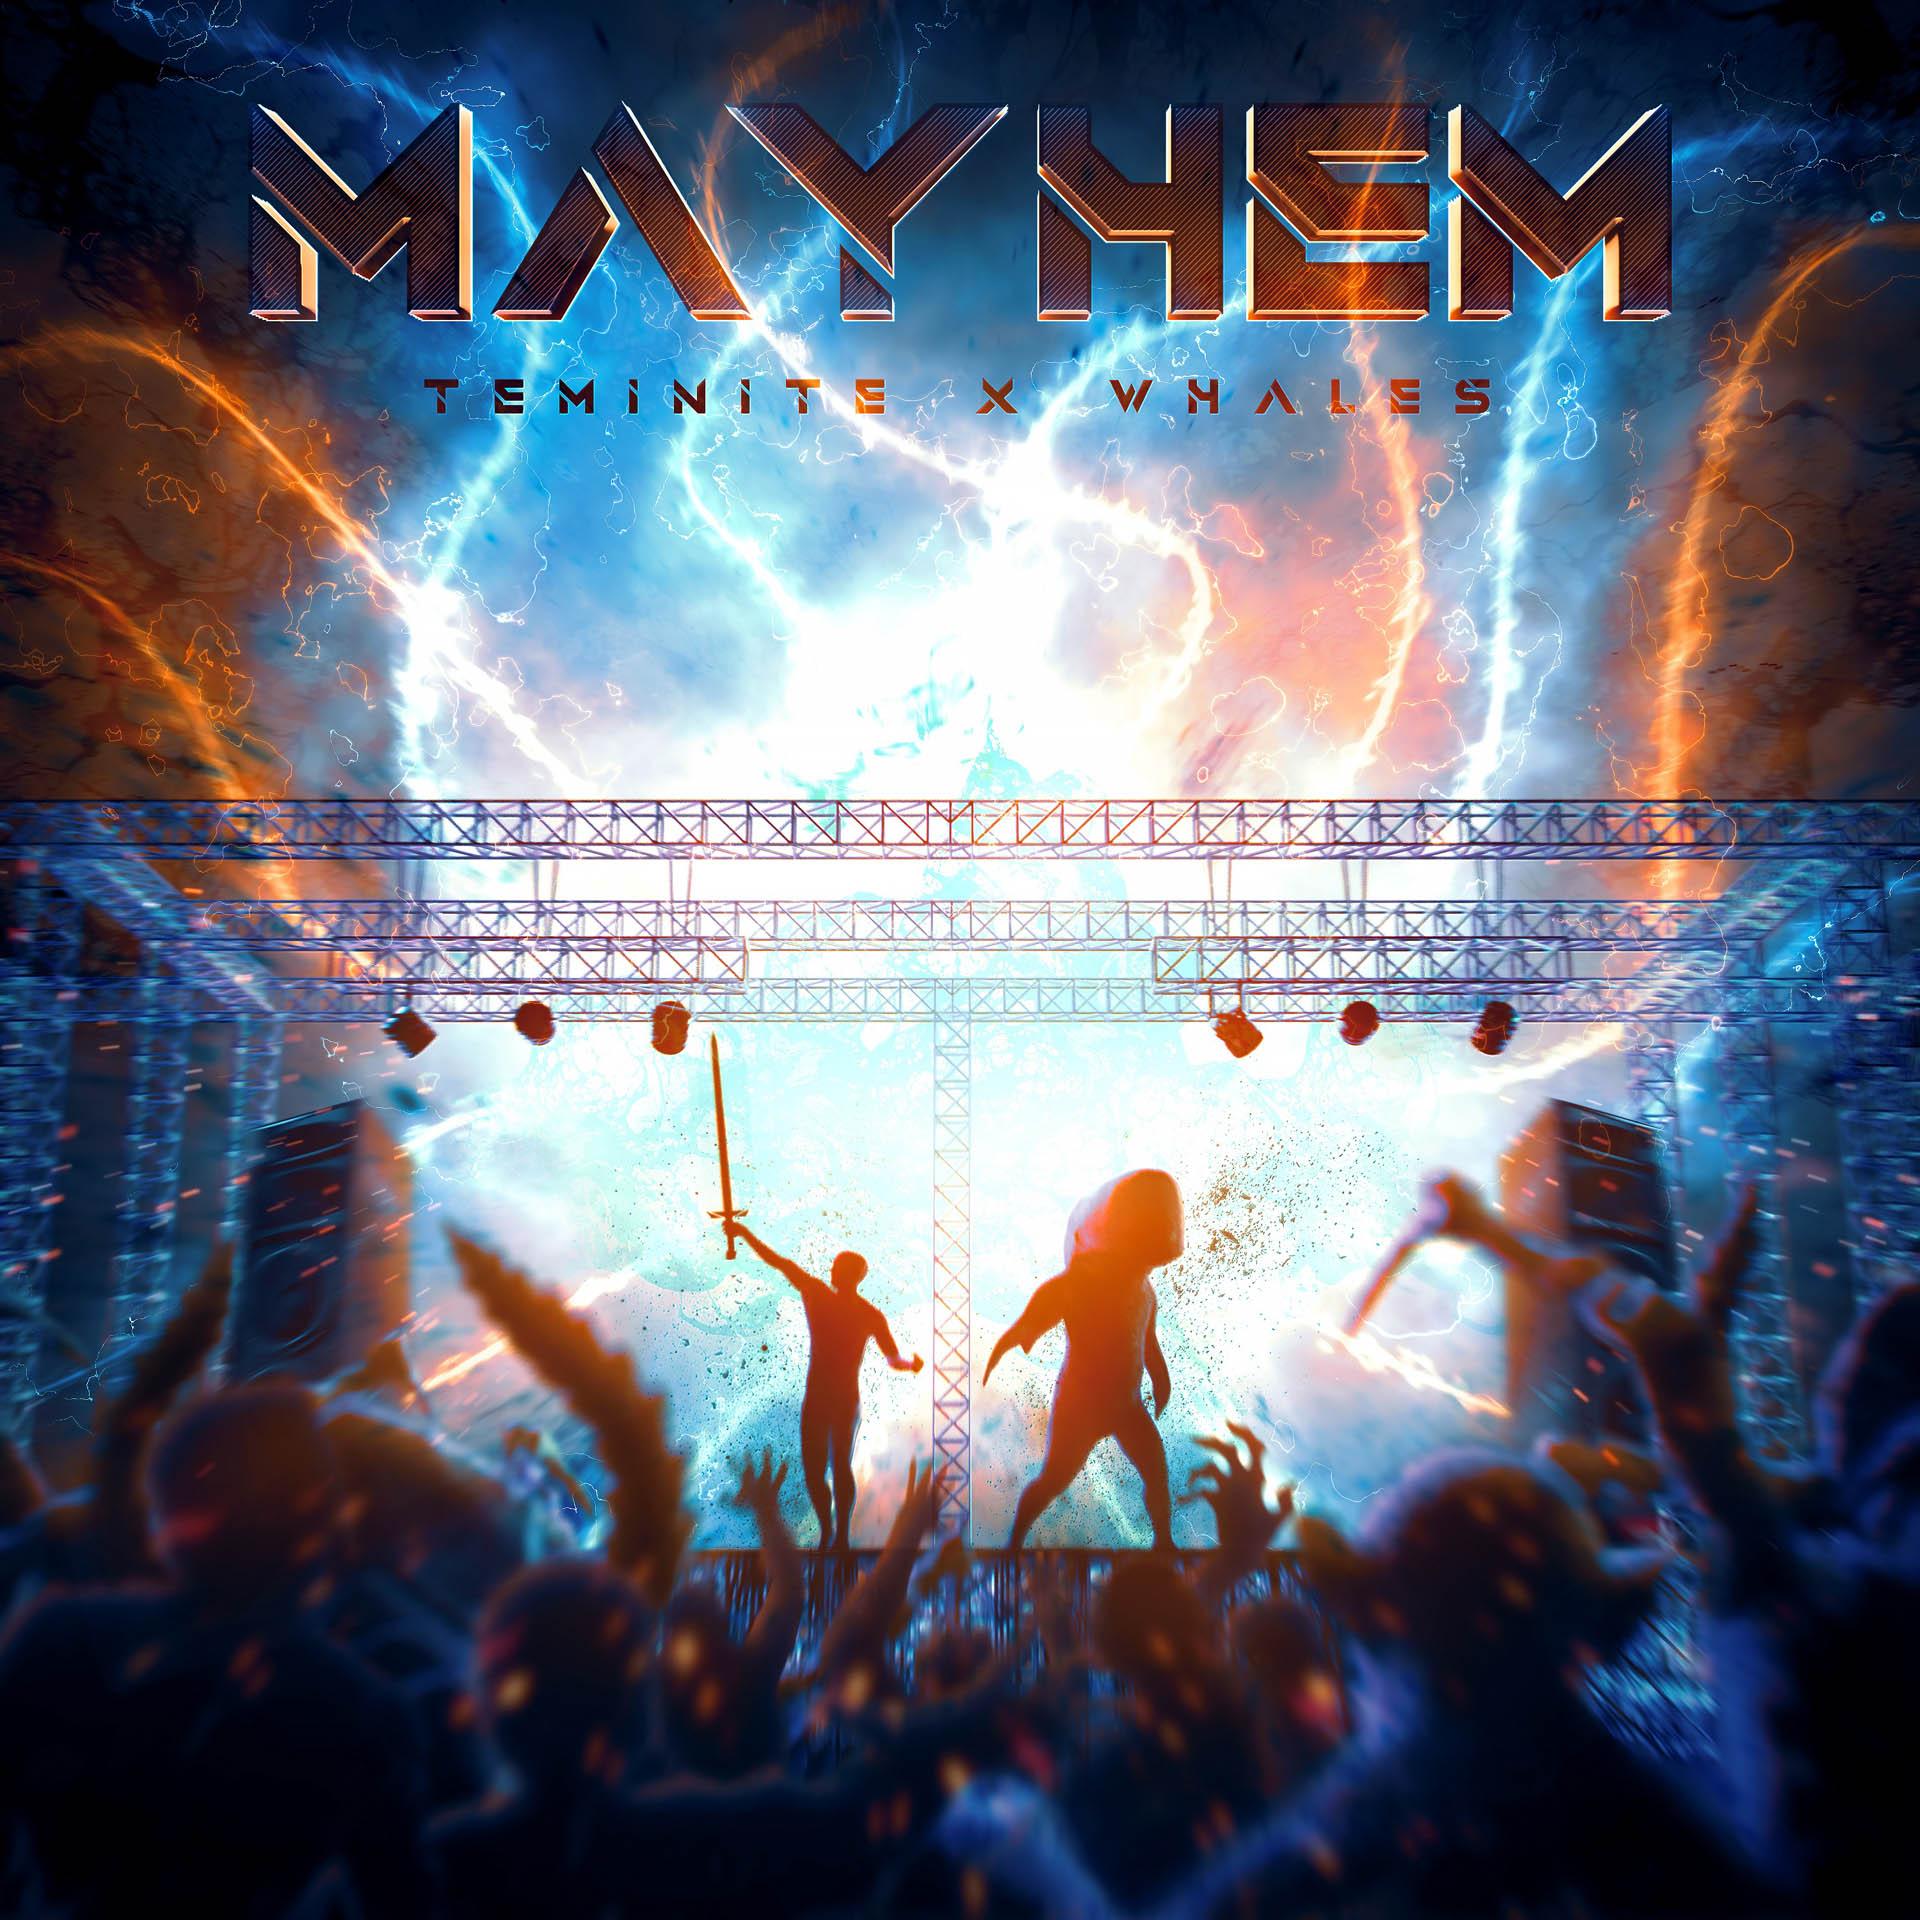 Teminite x Whales - Mayhem